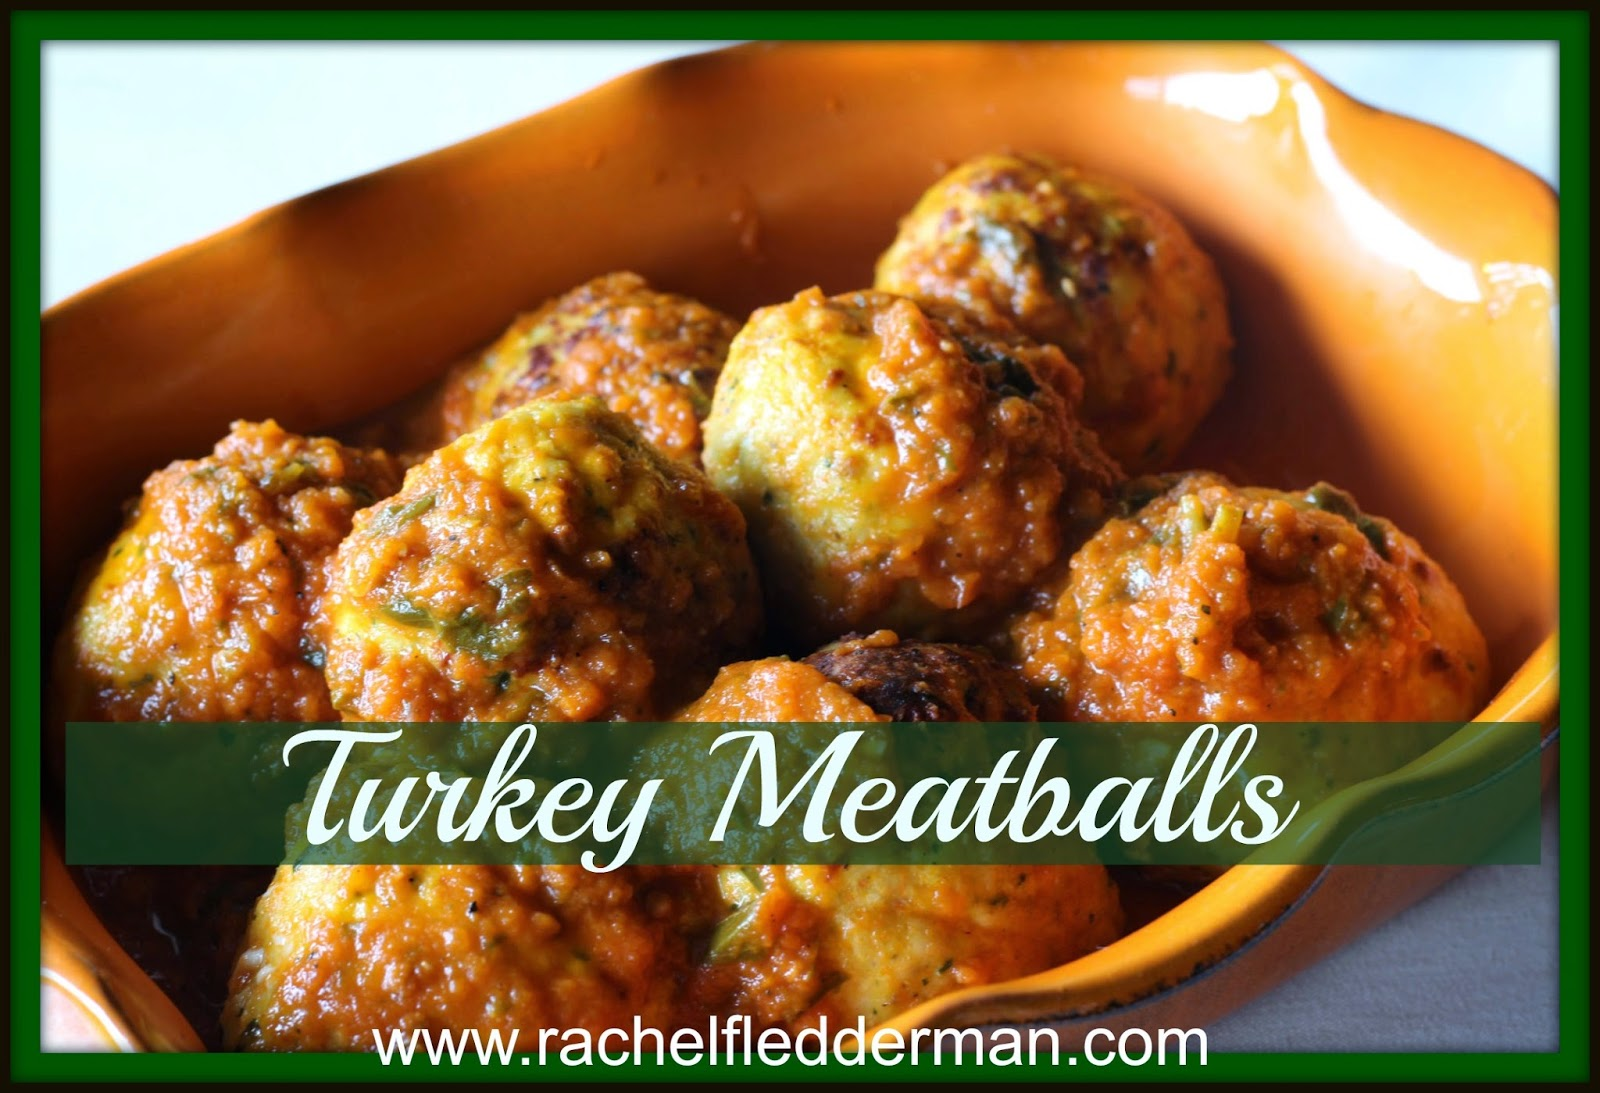 Tukey Meatballs